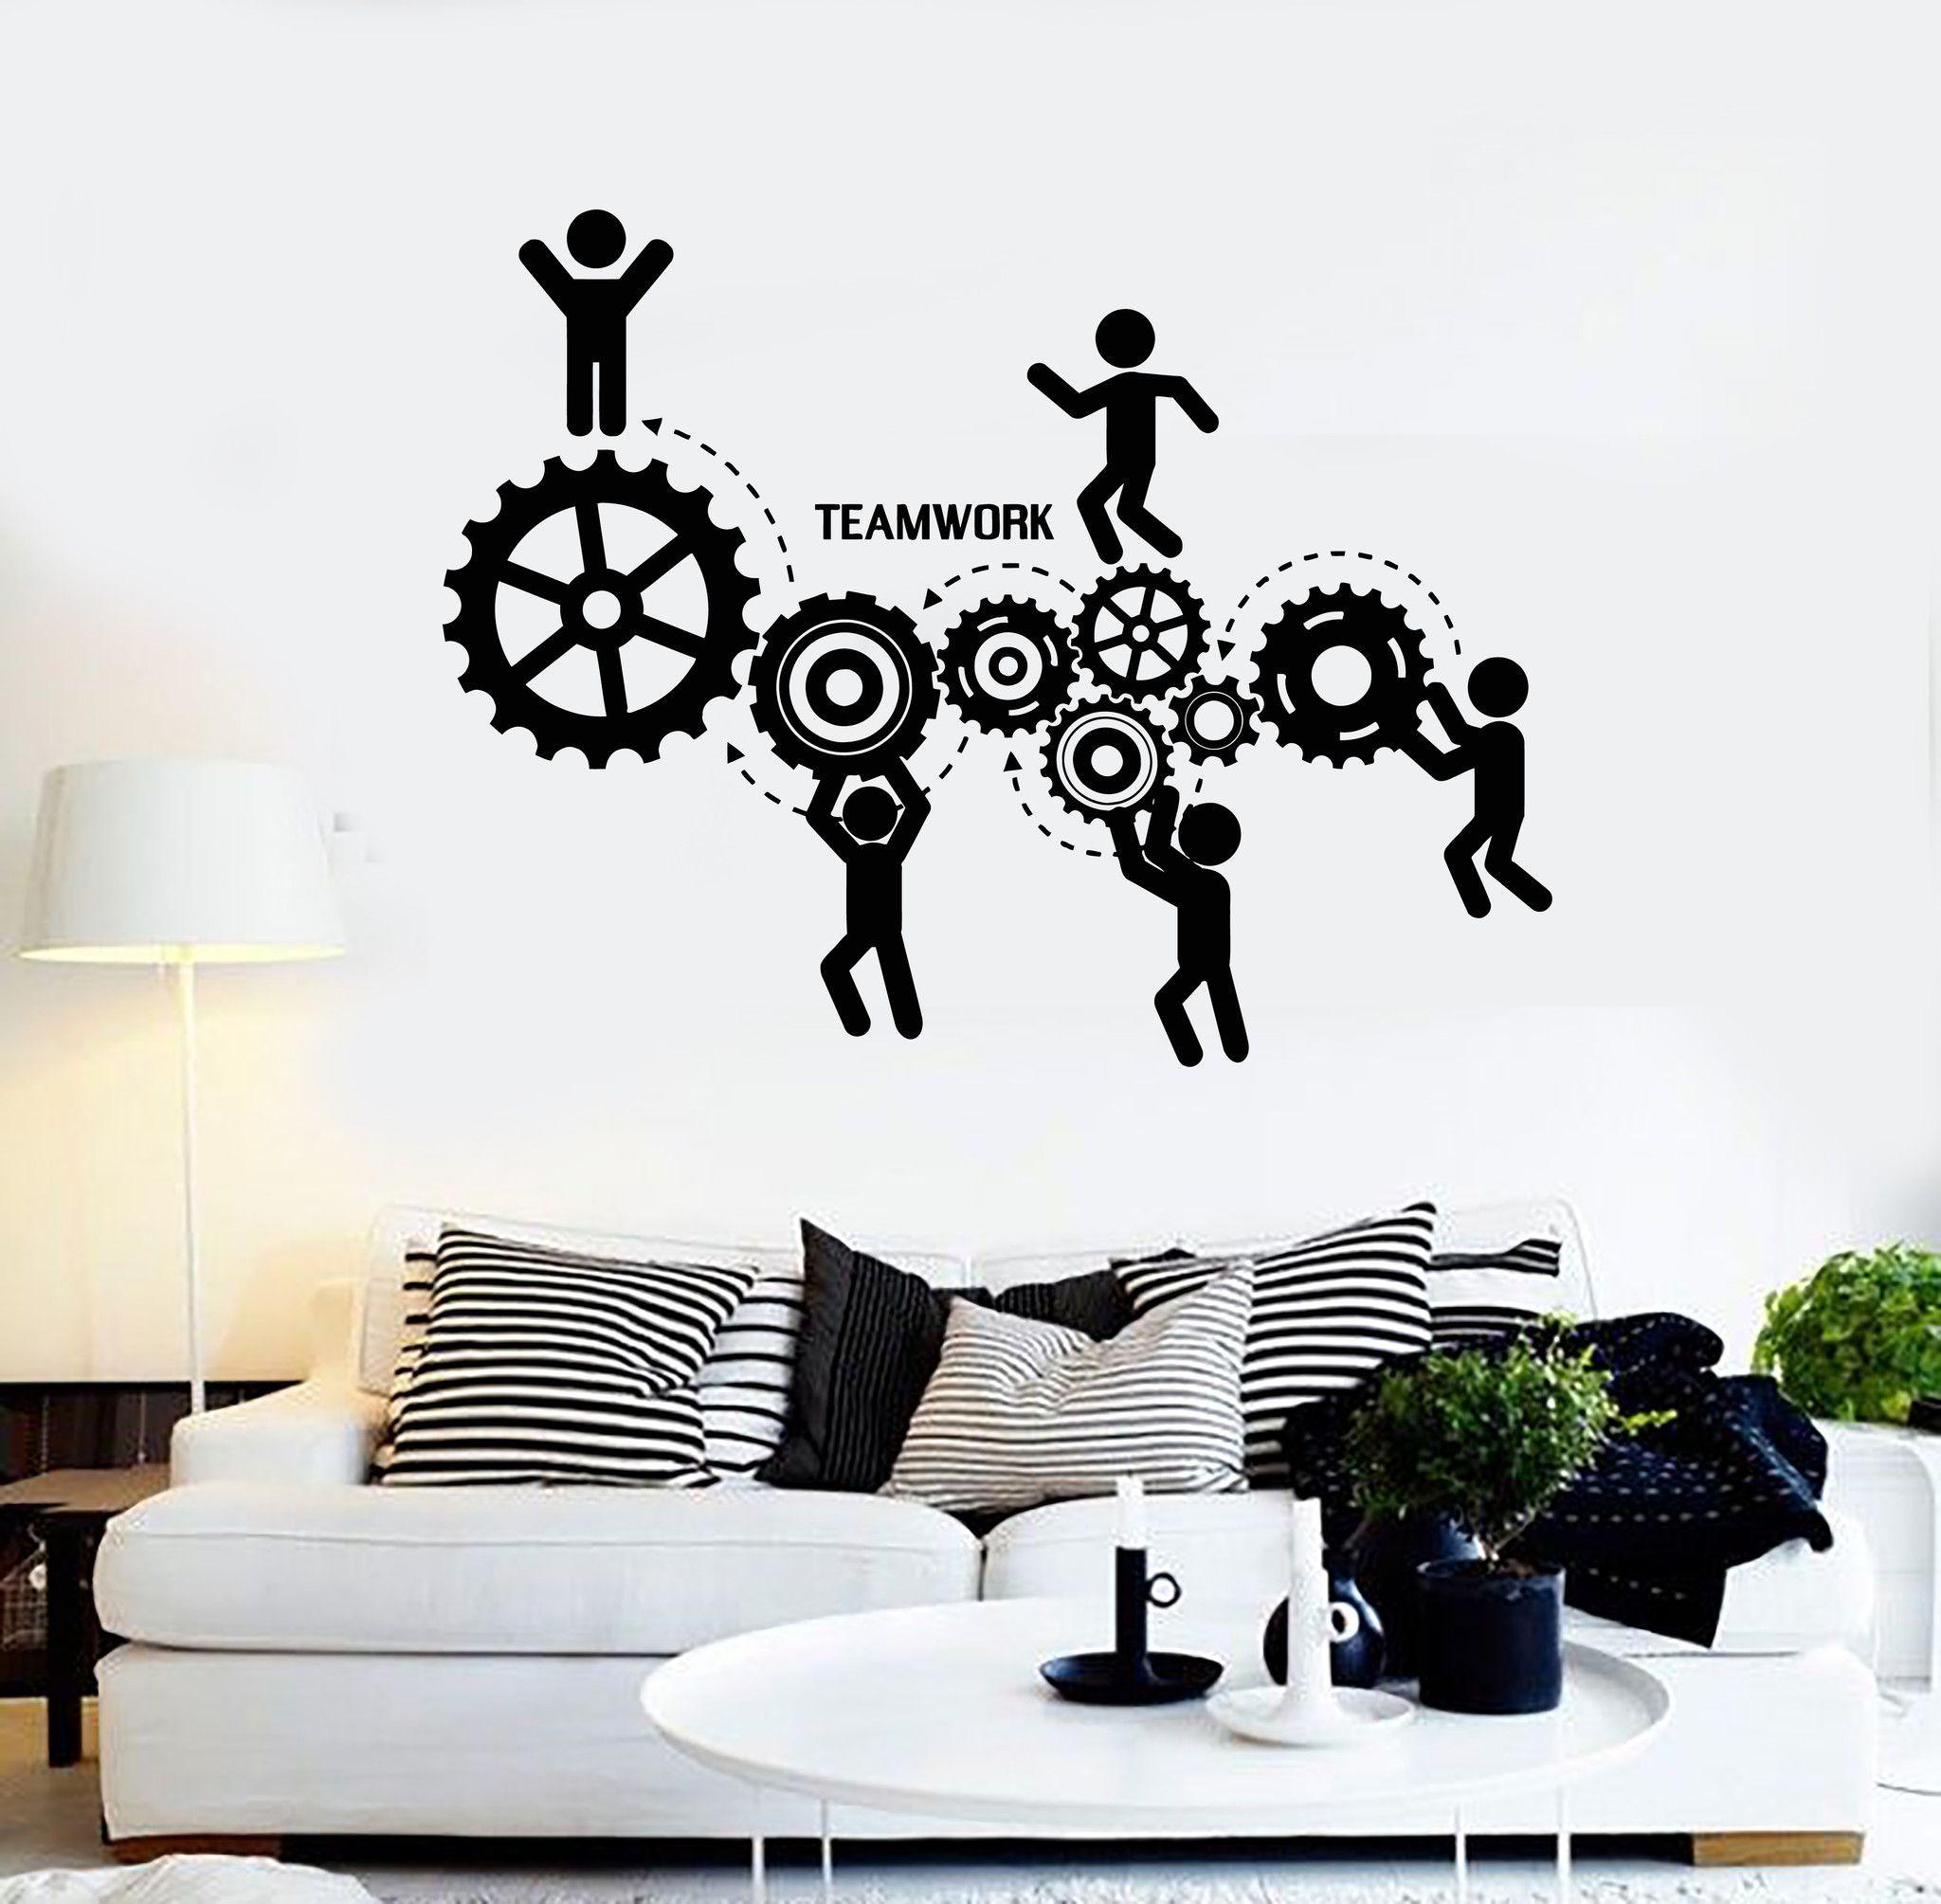 Vinyl wall decal teamwork office motivation worker for Decoration porte sticker